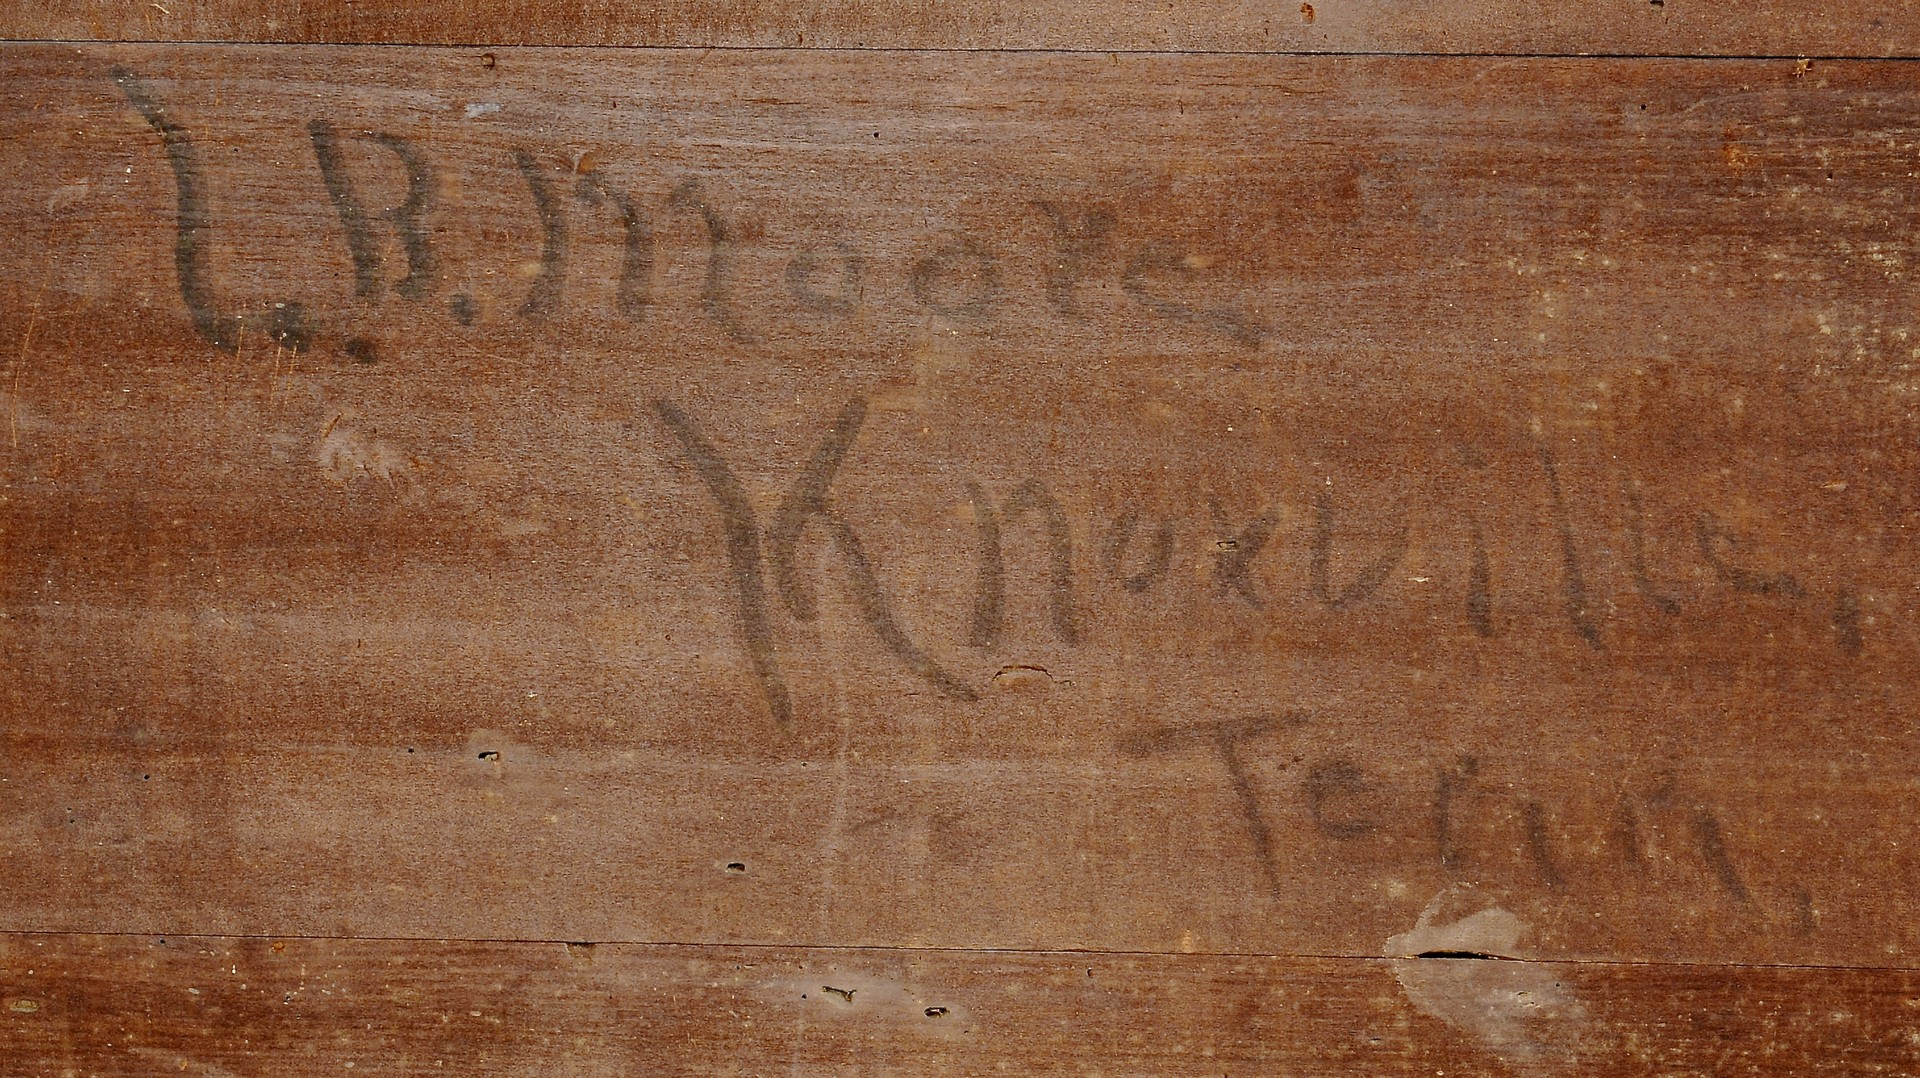 Lot 117: Knox Co. TN Walnut Chest of Drawers, inscription